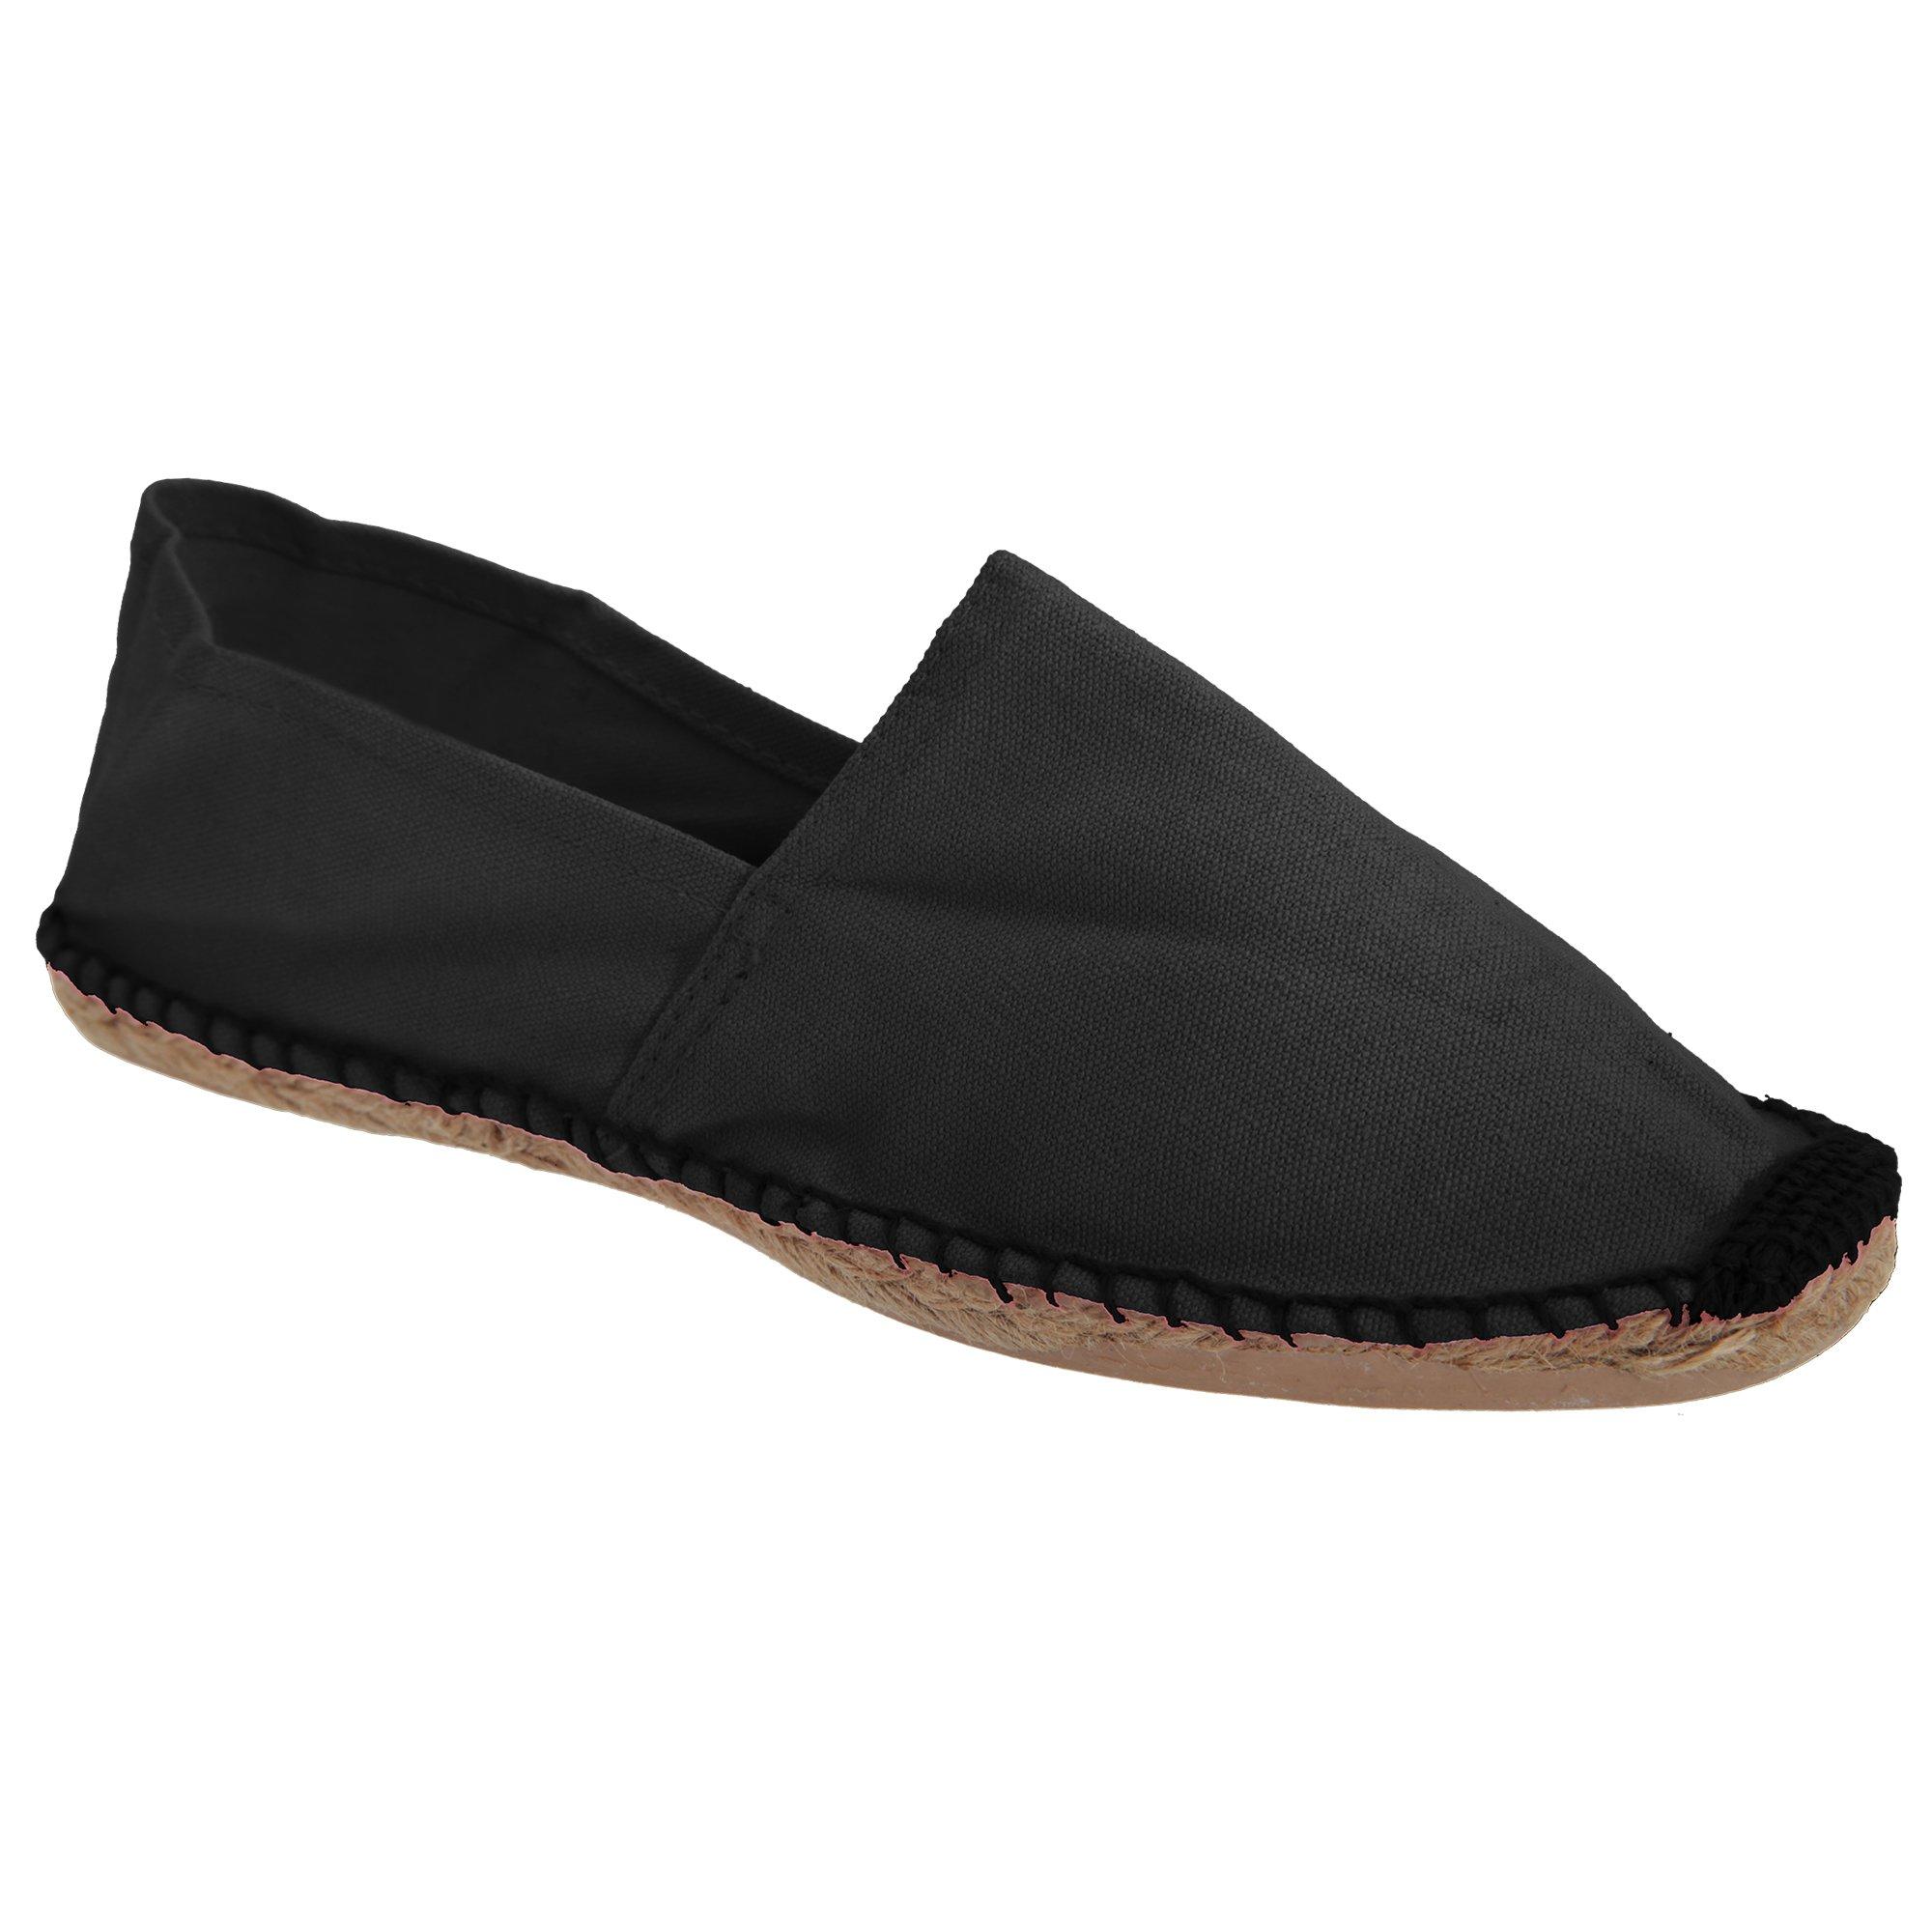 B&C Paradise Mens Vibrant Espadrille Shoes (7.5 US) (Black)